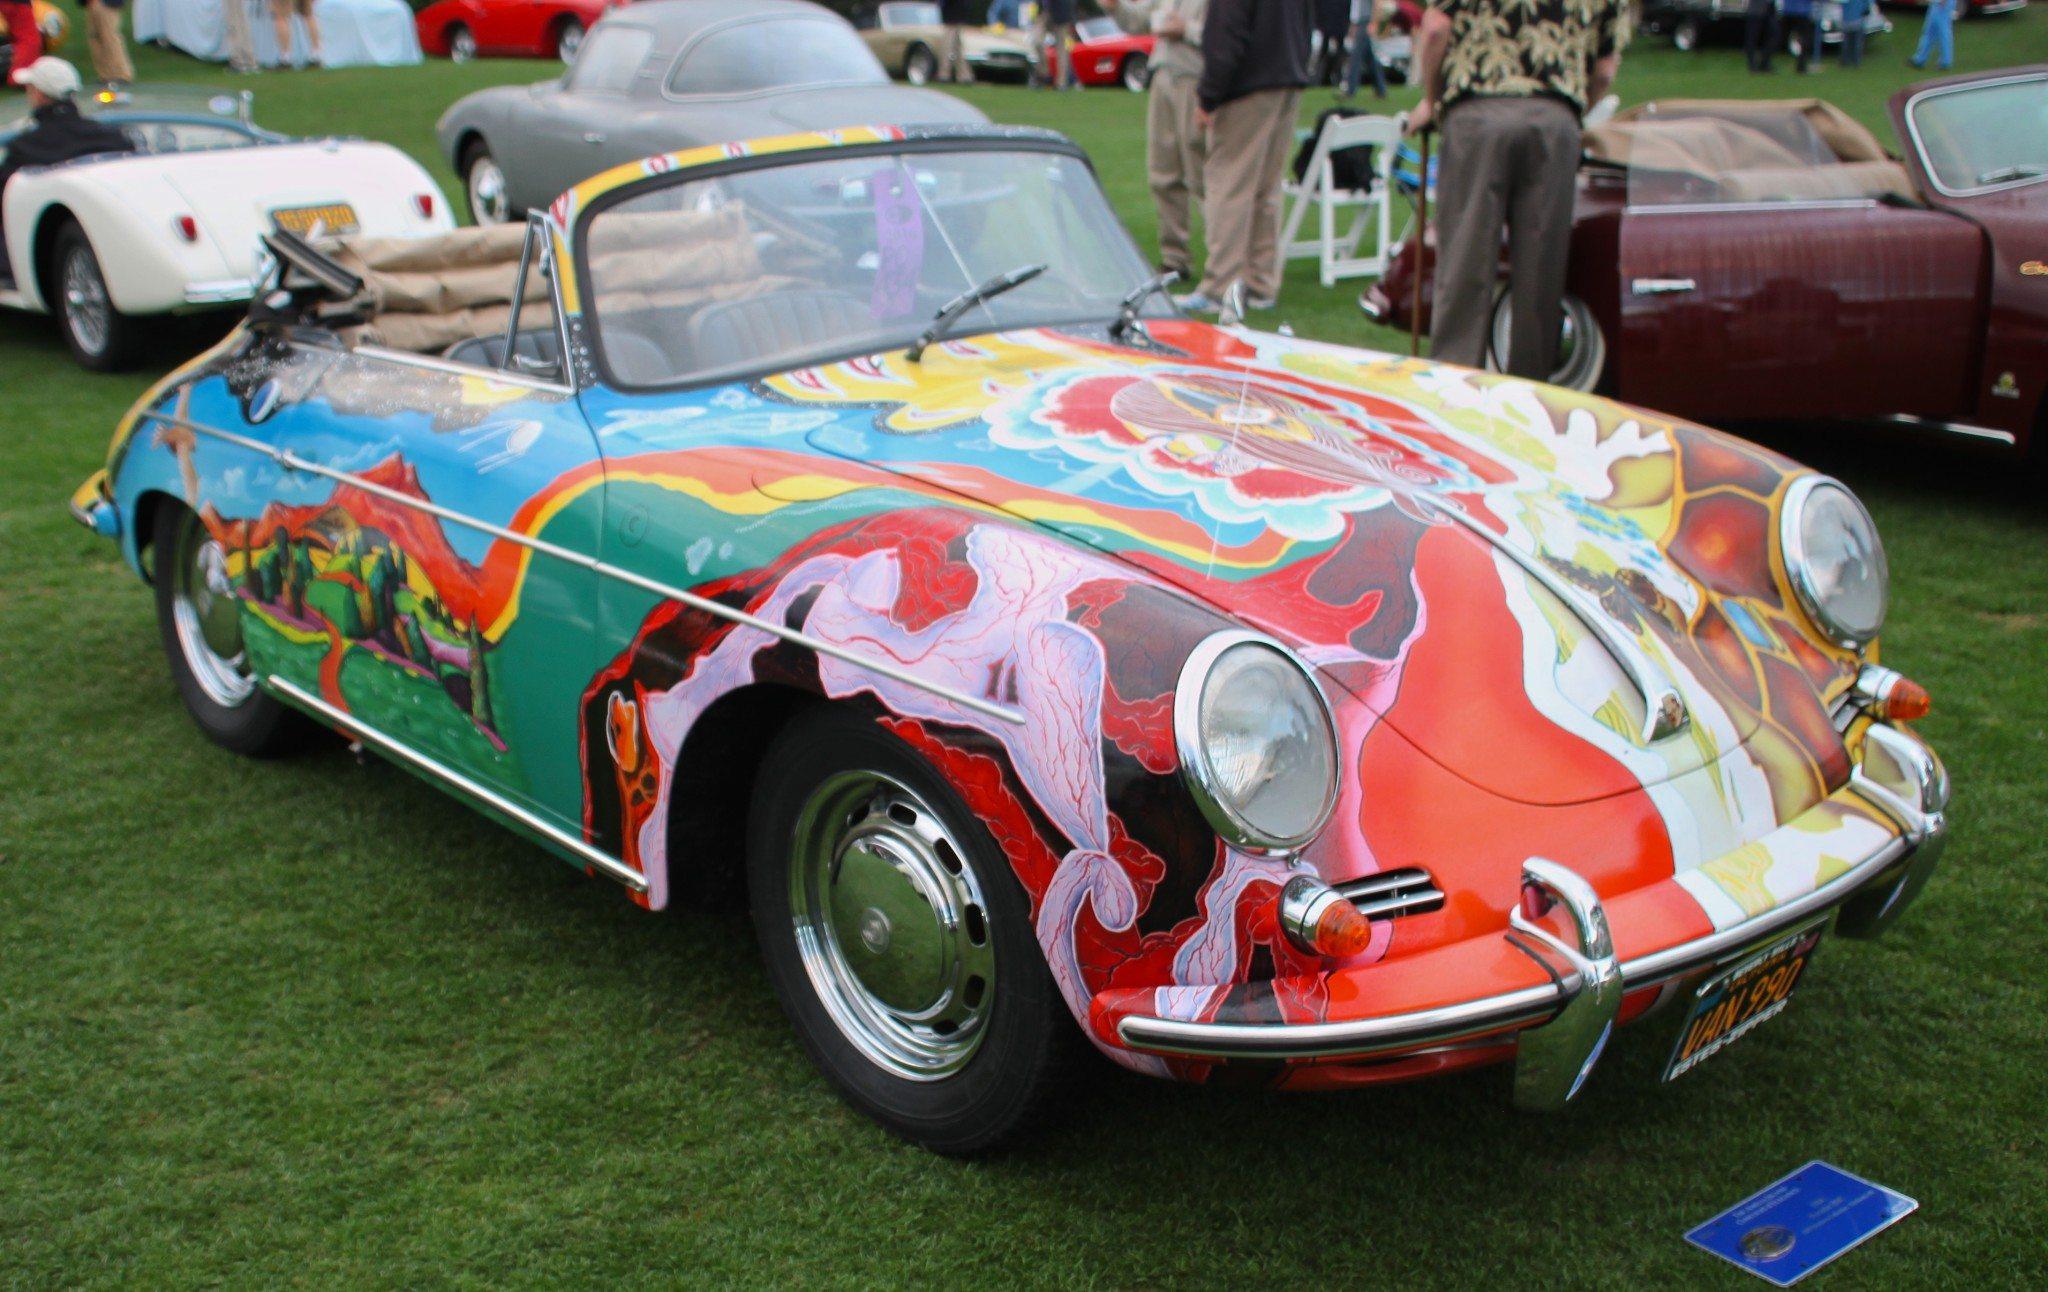 the very rare Janis Joplin 1964 Porsche 356 Cabriolet